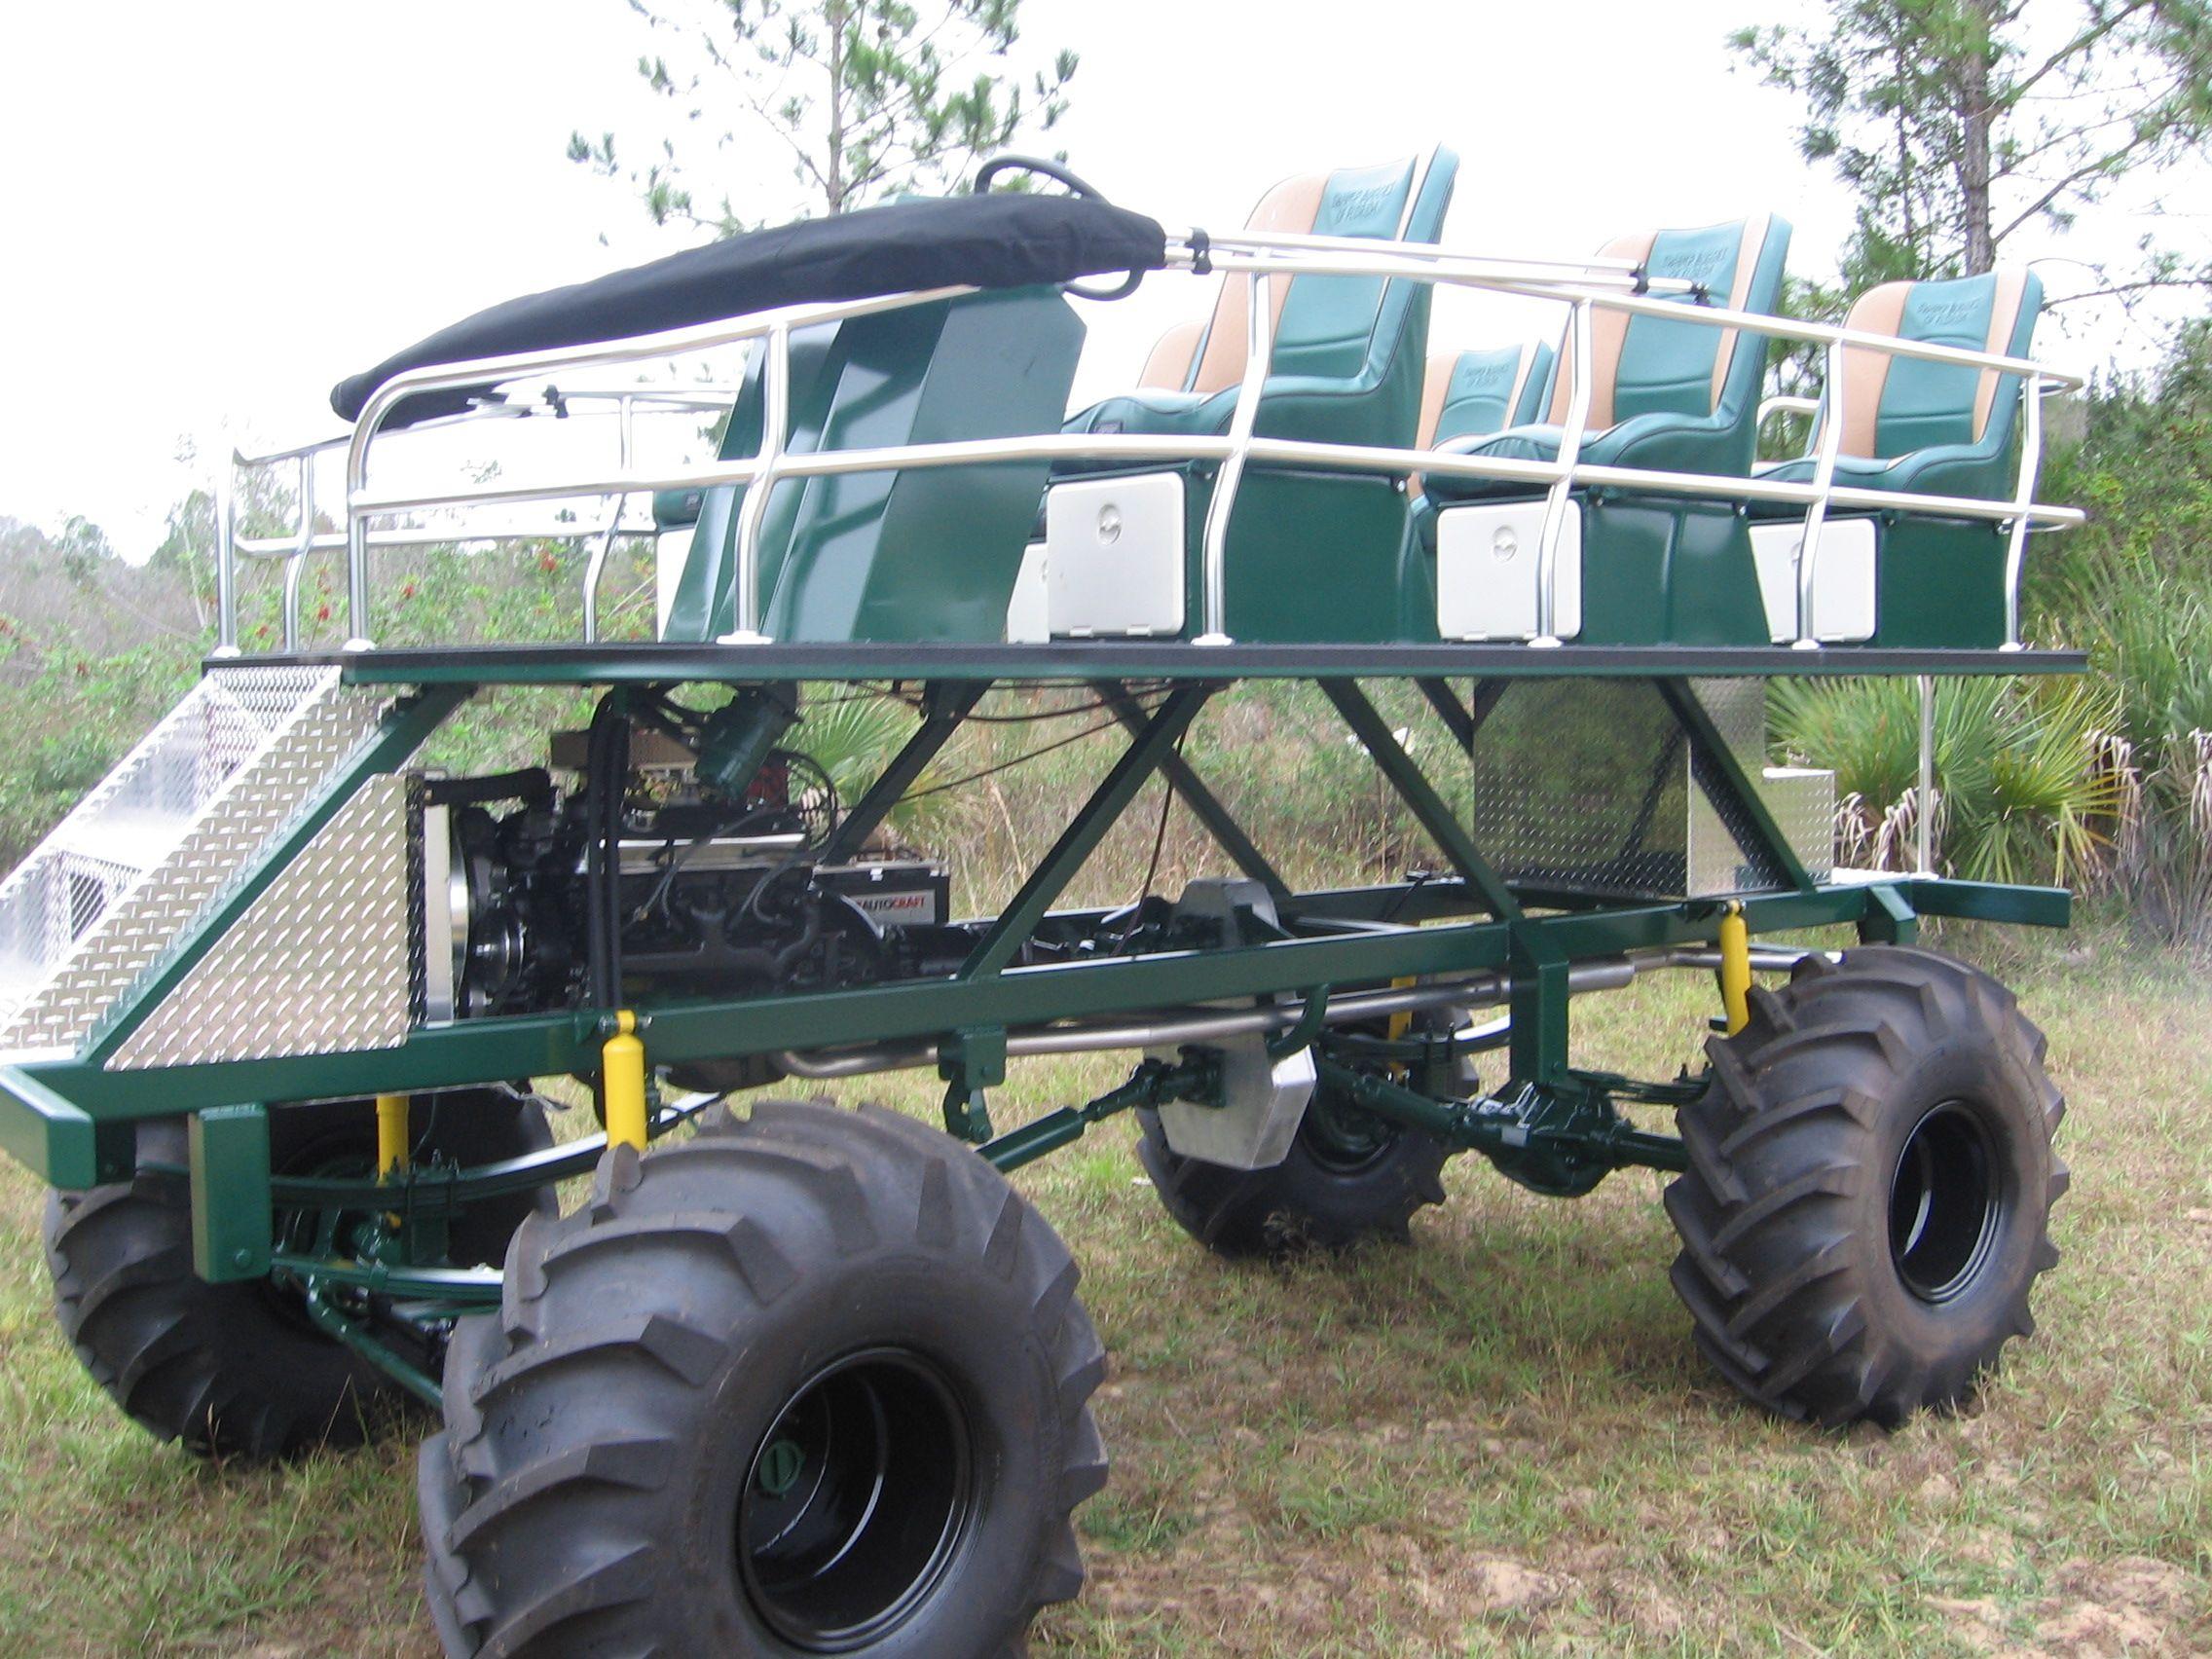 Swamp Buggy Parts   ton, 6-seat Swamp Buggy Blueprint 355 V8 engine 350 H.P. SBFL 3 to 1 .